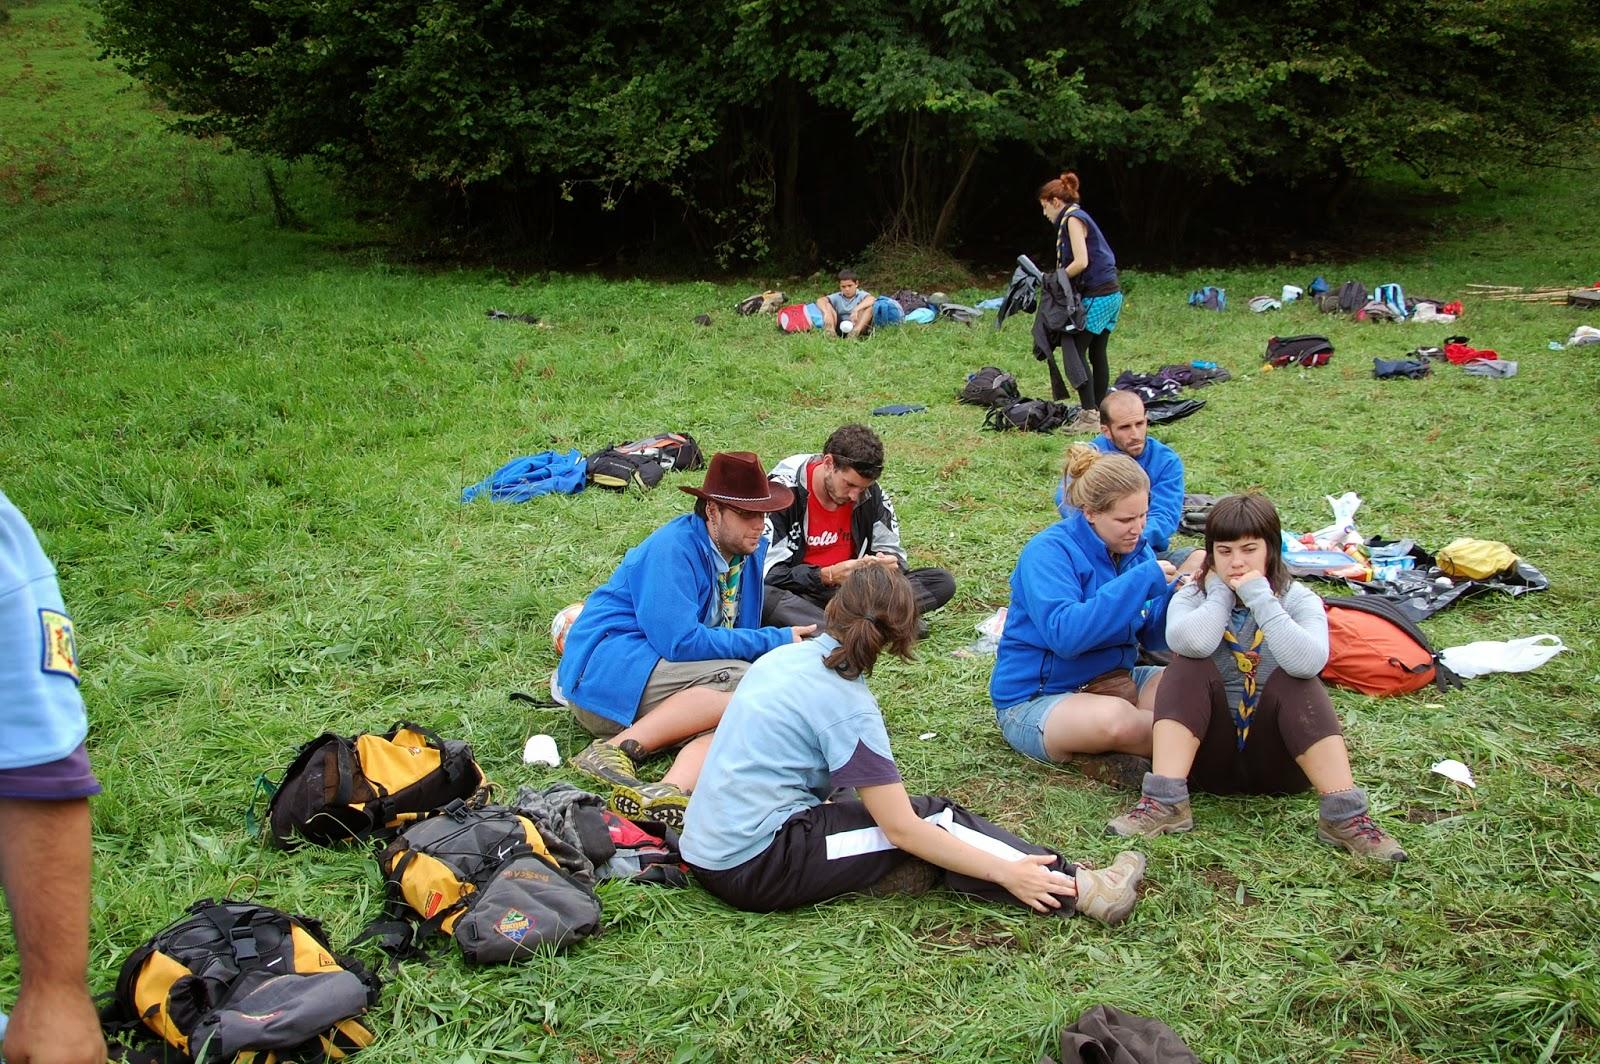 Campaments Estiu RolandKing 2011 - DSC_0155%2B2.JPG